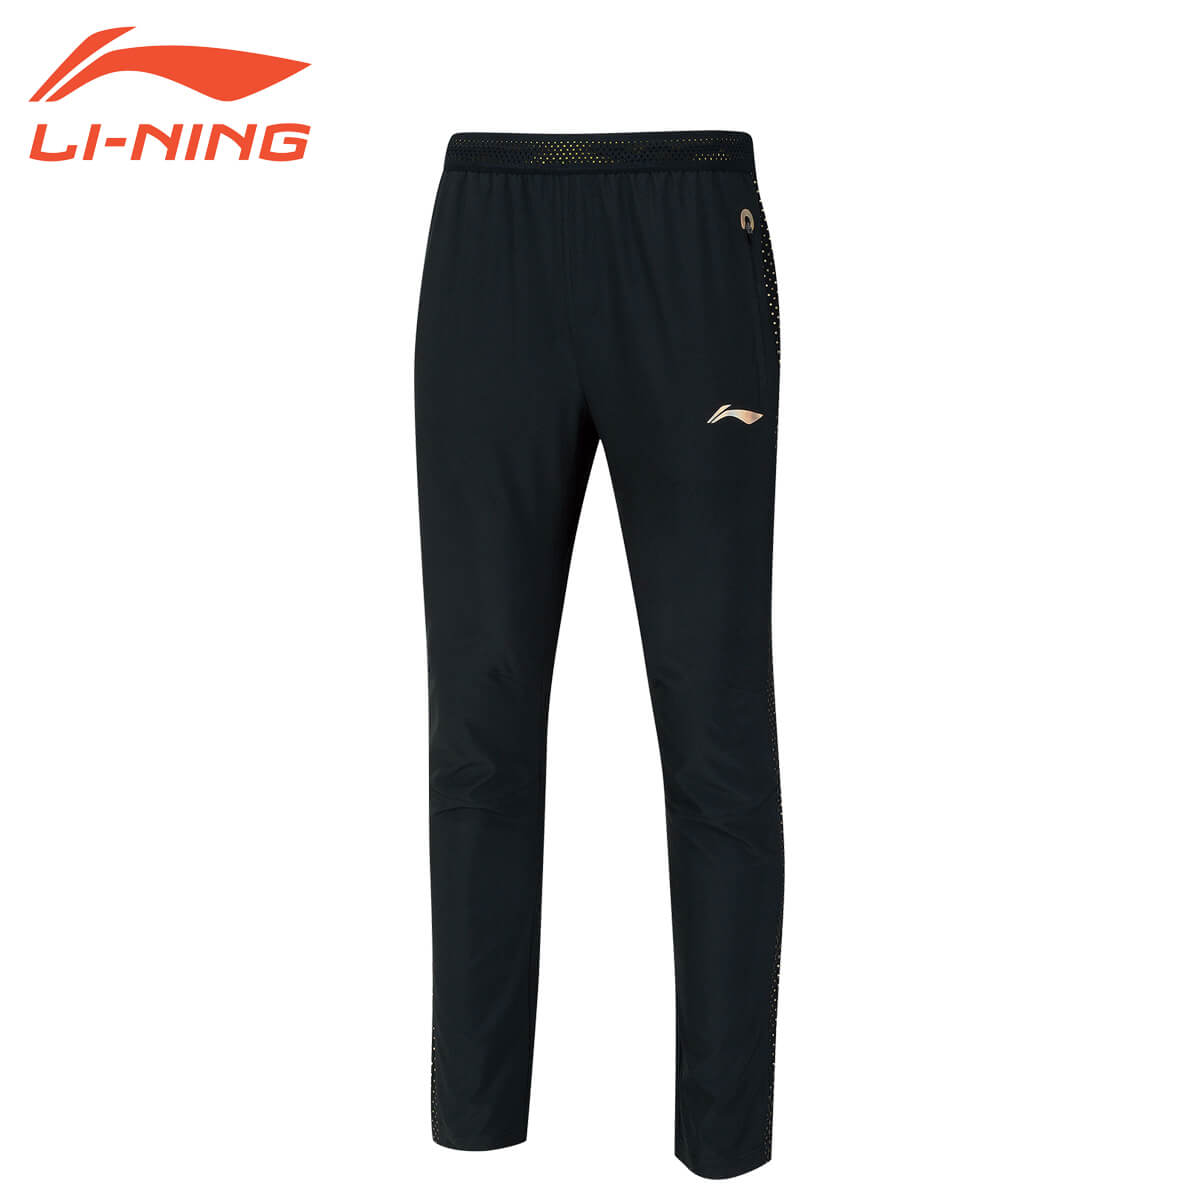 LI-NING AYKN405 トレーニングパンツ ナショナルチームモデル(ユニ/メンズ) バドミントンウェア リーニン